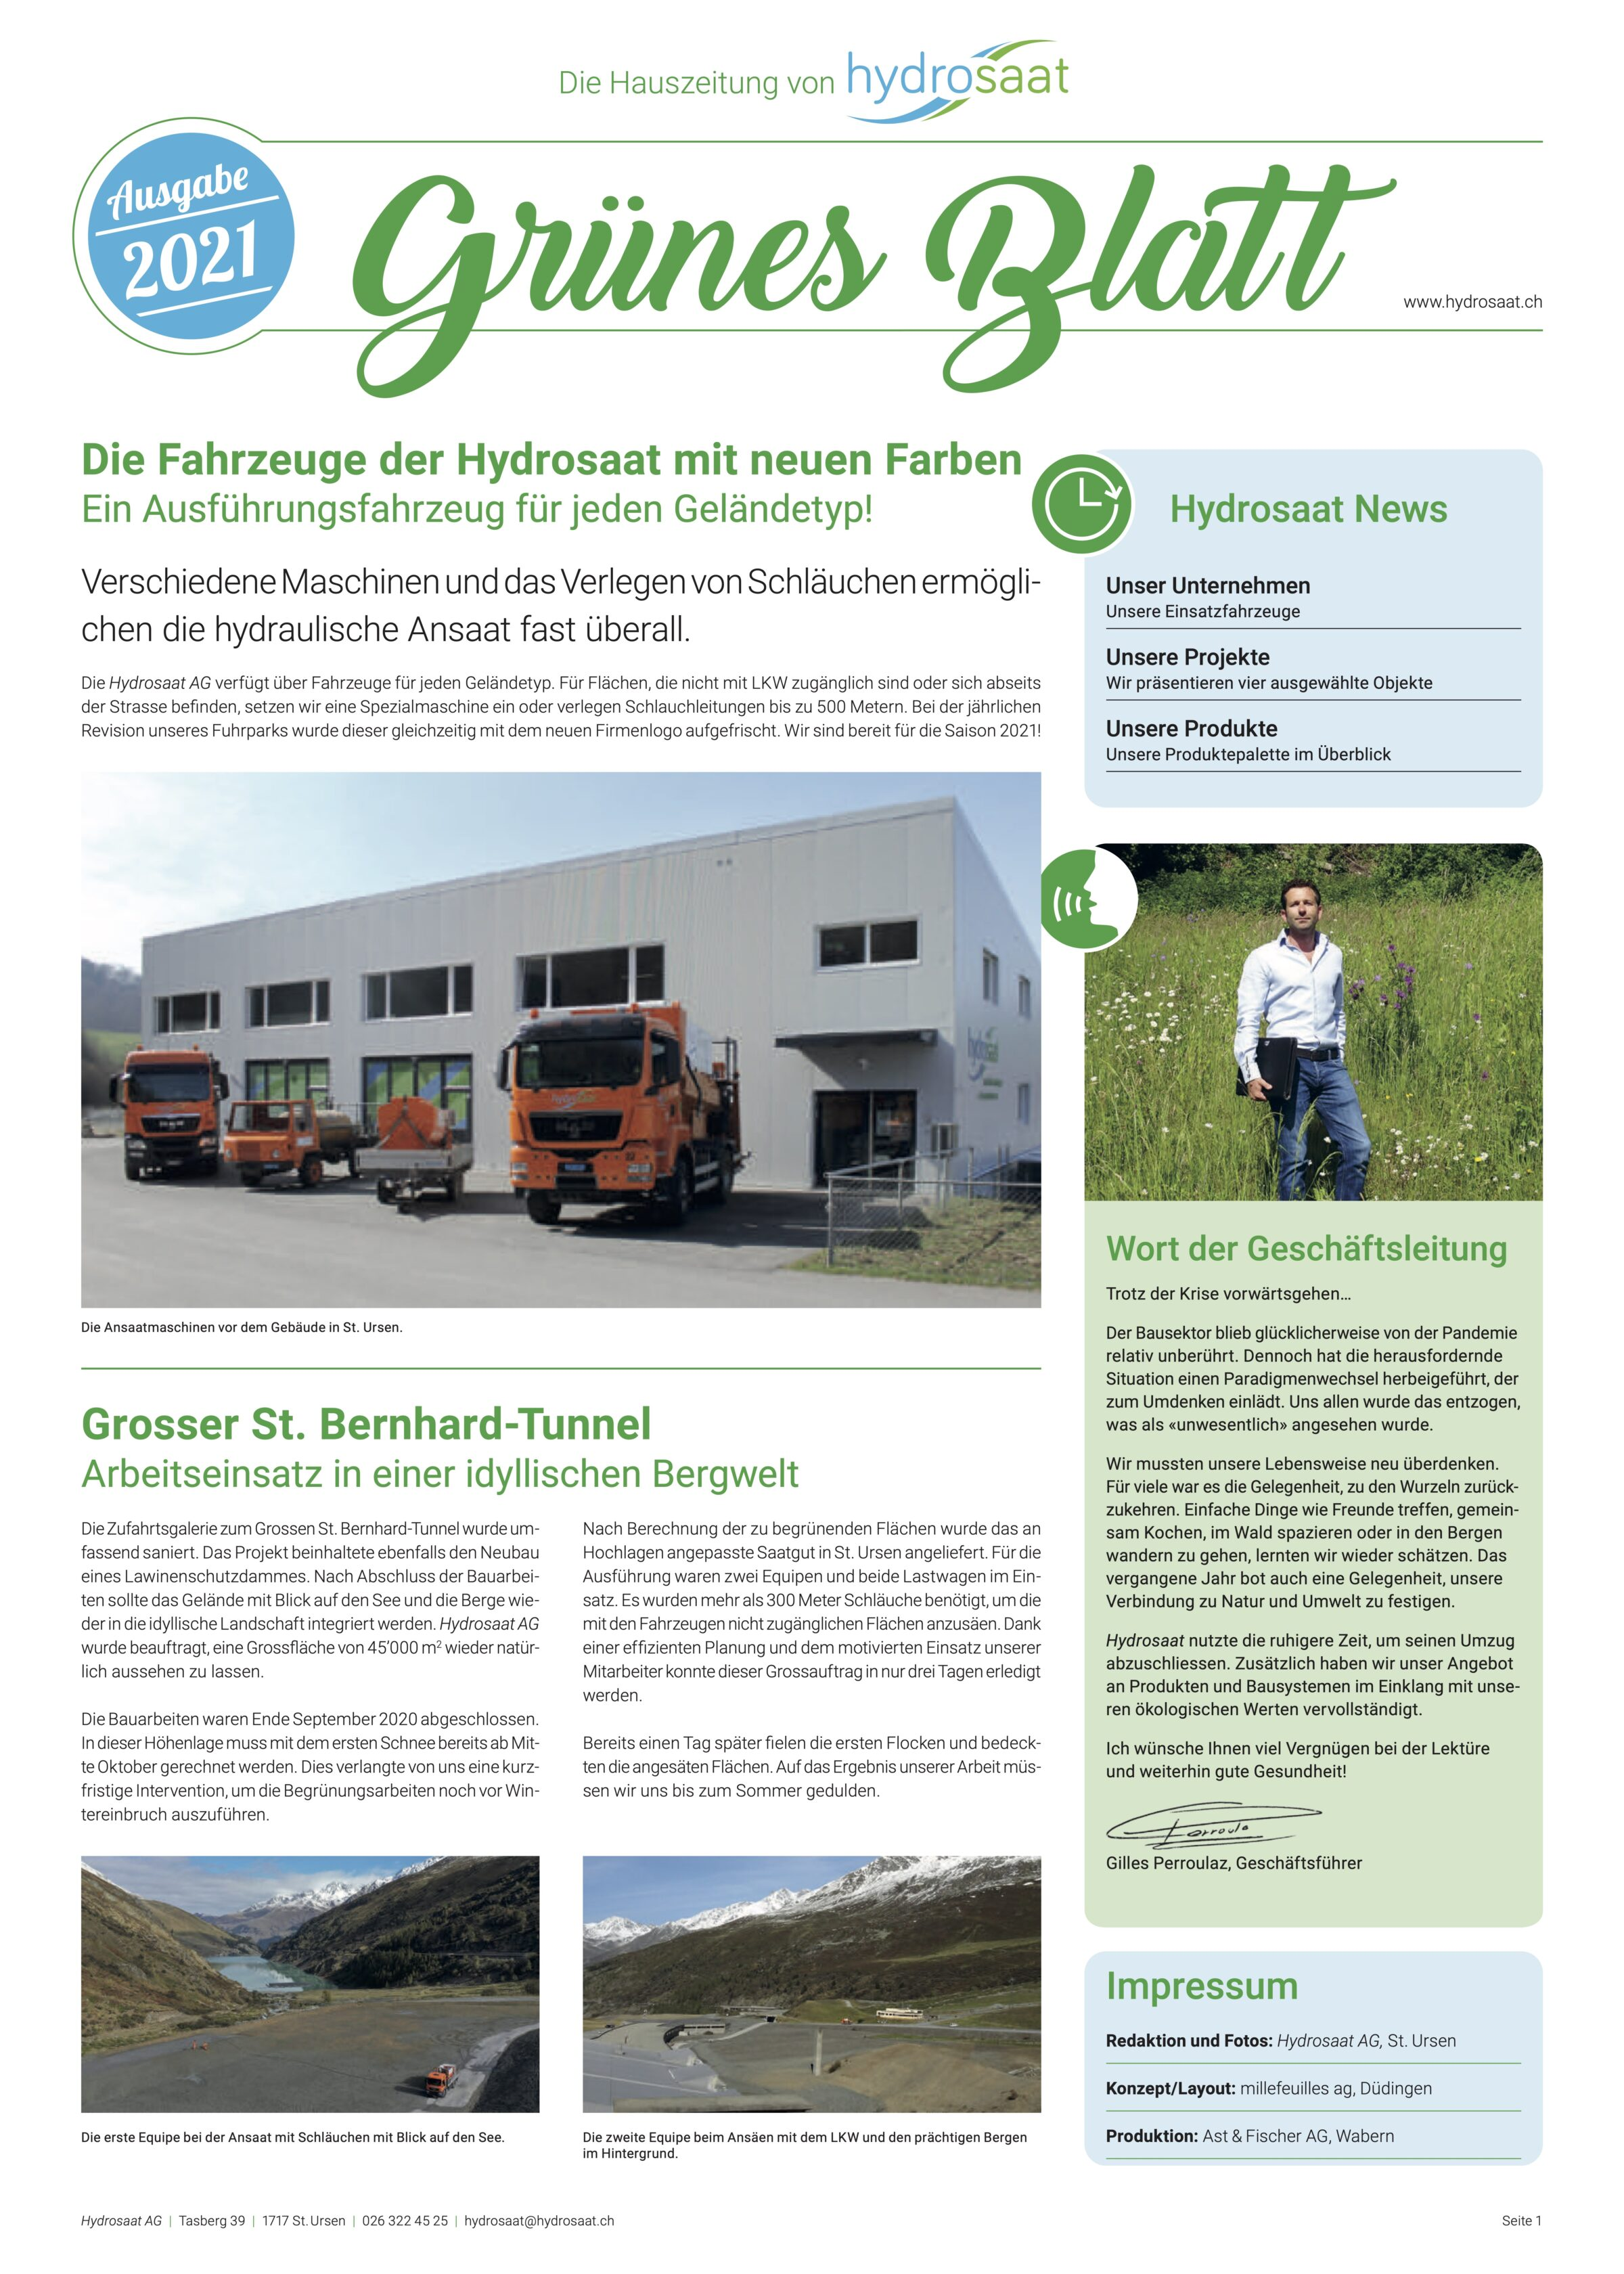 Hydrosaat Grünes Blatt 2021